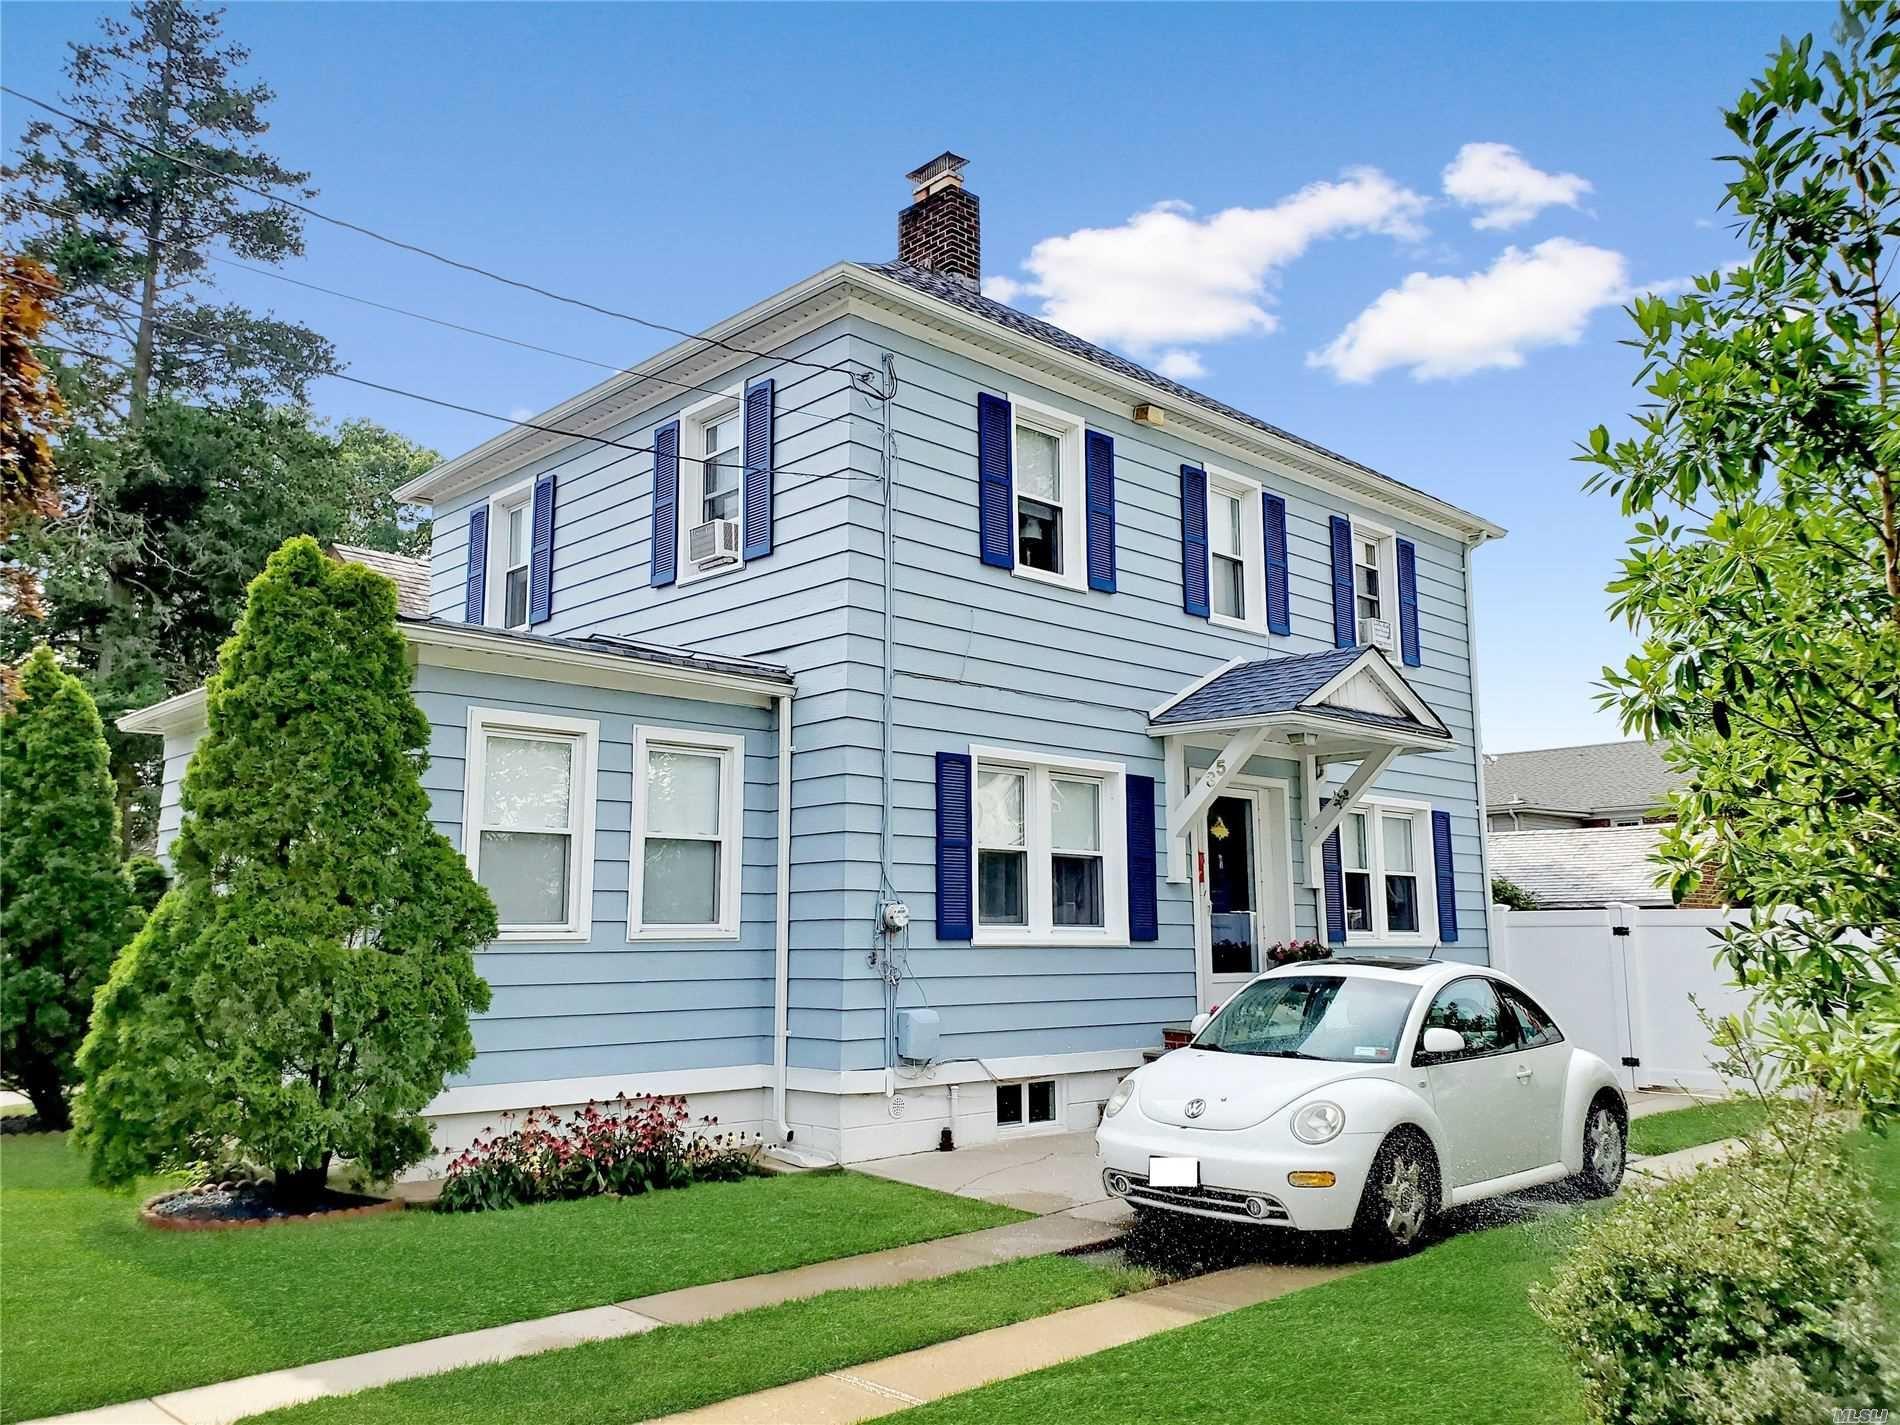 35 Beatrice Ct, Hempstead, NY 11550 - MLS#: 3238057